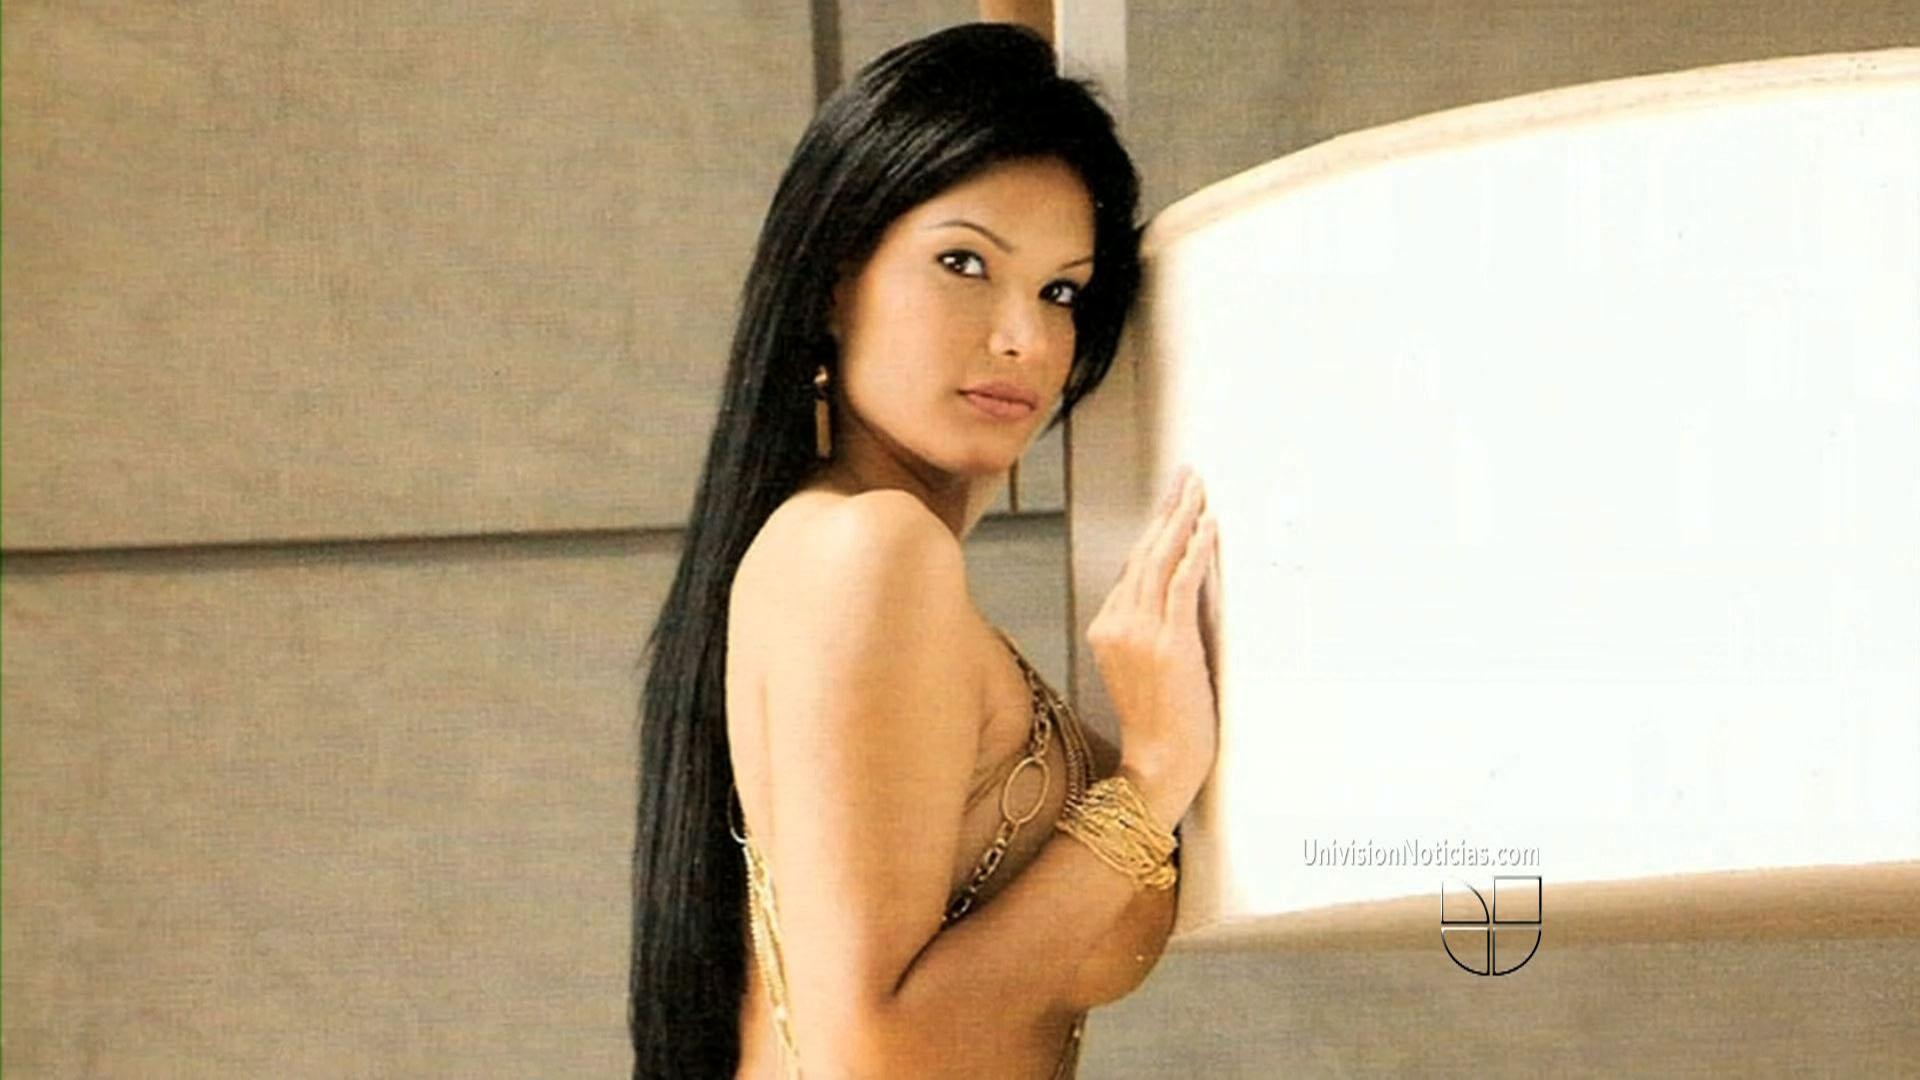 prostitutas en venezuela videos porno con prostitutas